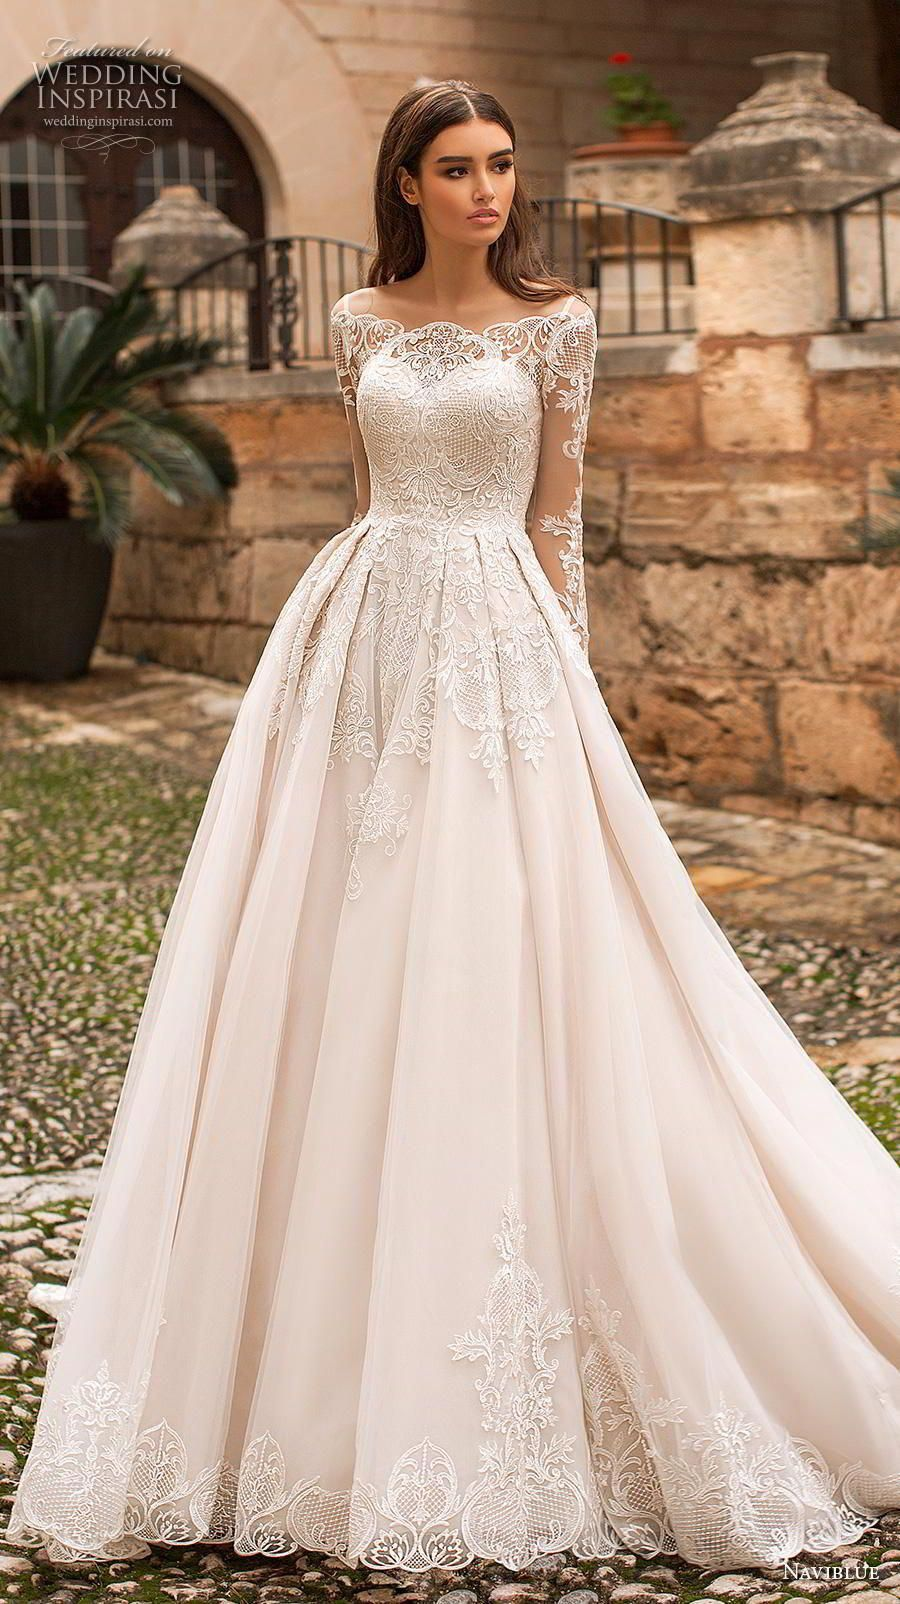 Naviblue 2019 Bridal Long Sleeves Illusion Off The Shoulder Sweetheart Wedding Dress Long Sleeve Long Sleeve Wedding Dress Lace Lace Wedding Dress With Sleeves [ 1604 x 900 Pixel ]